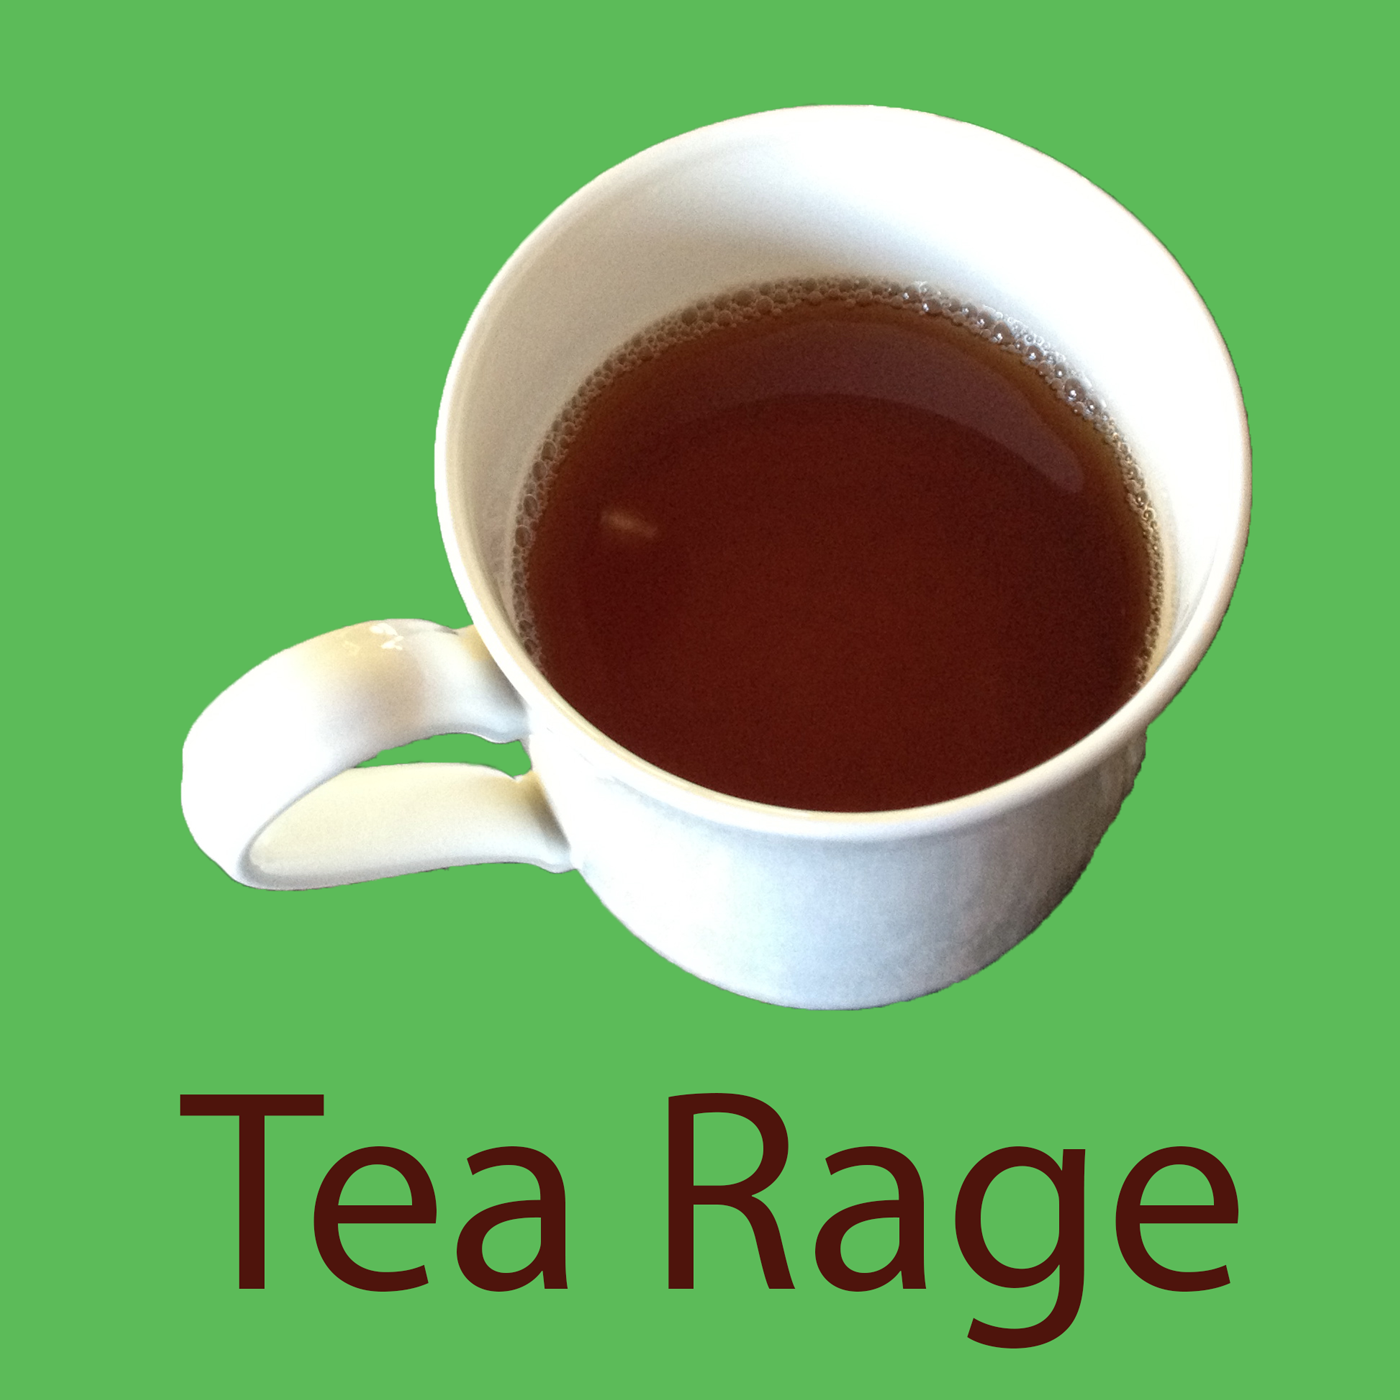 008: Tea At Work